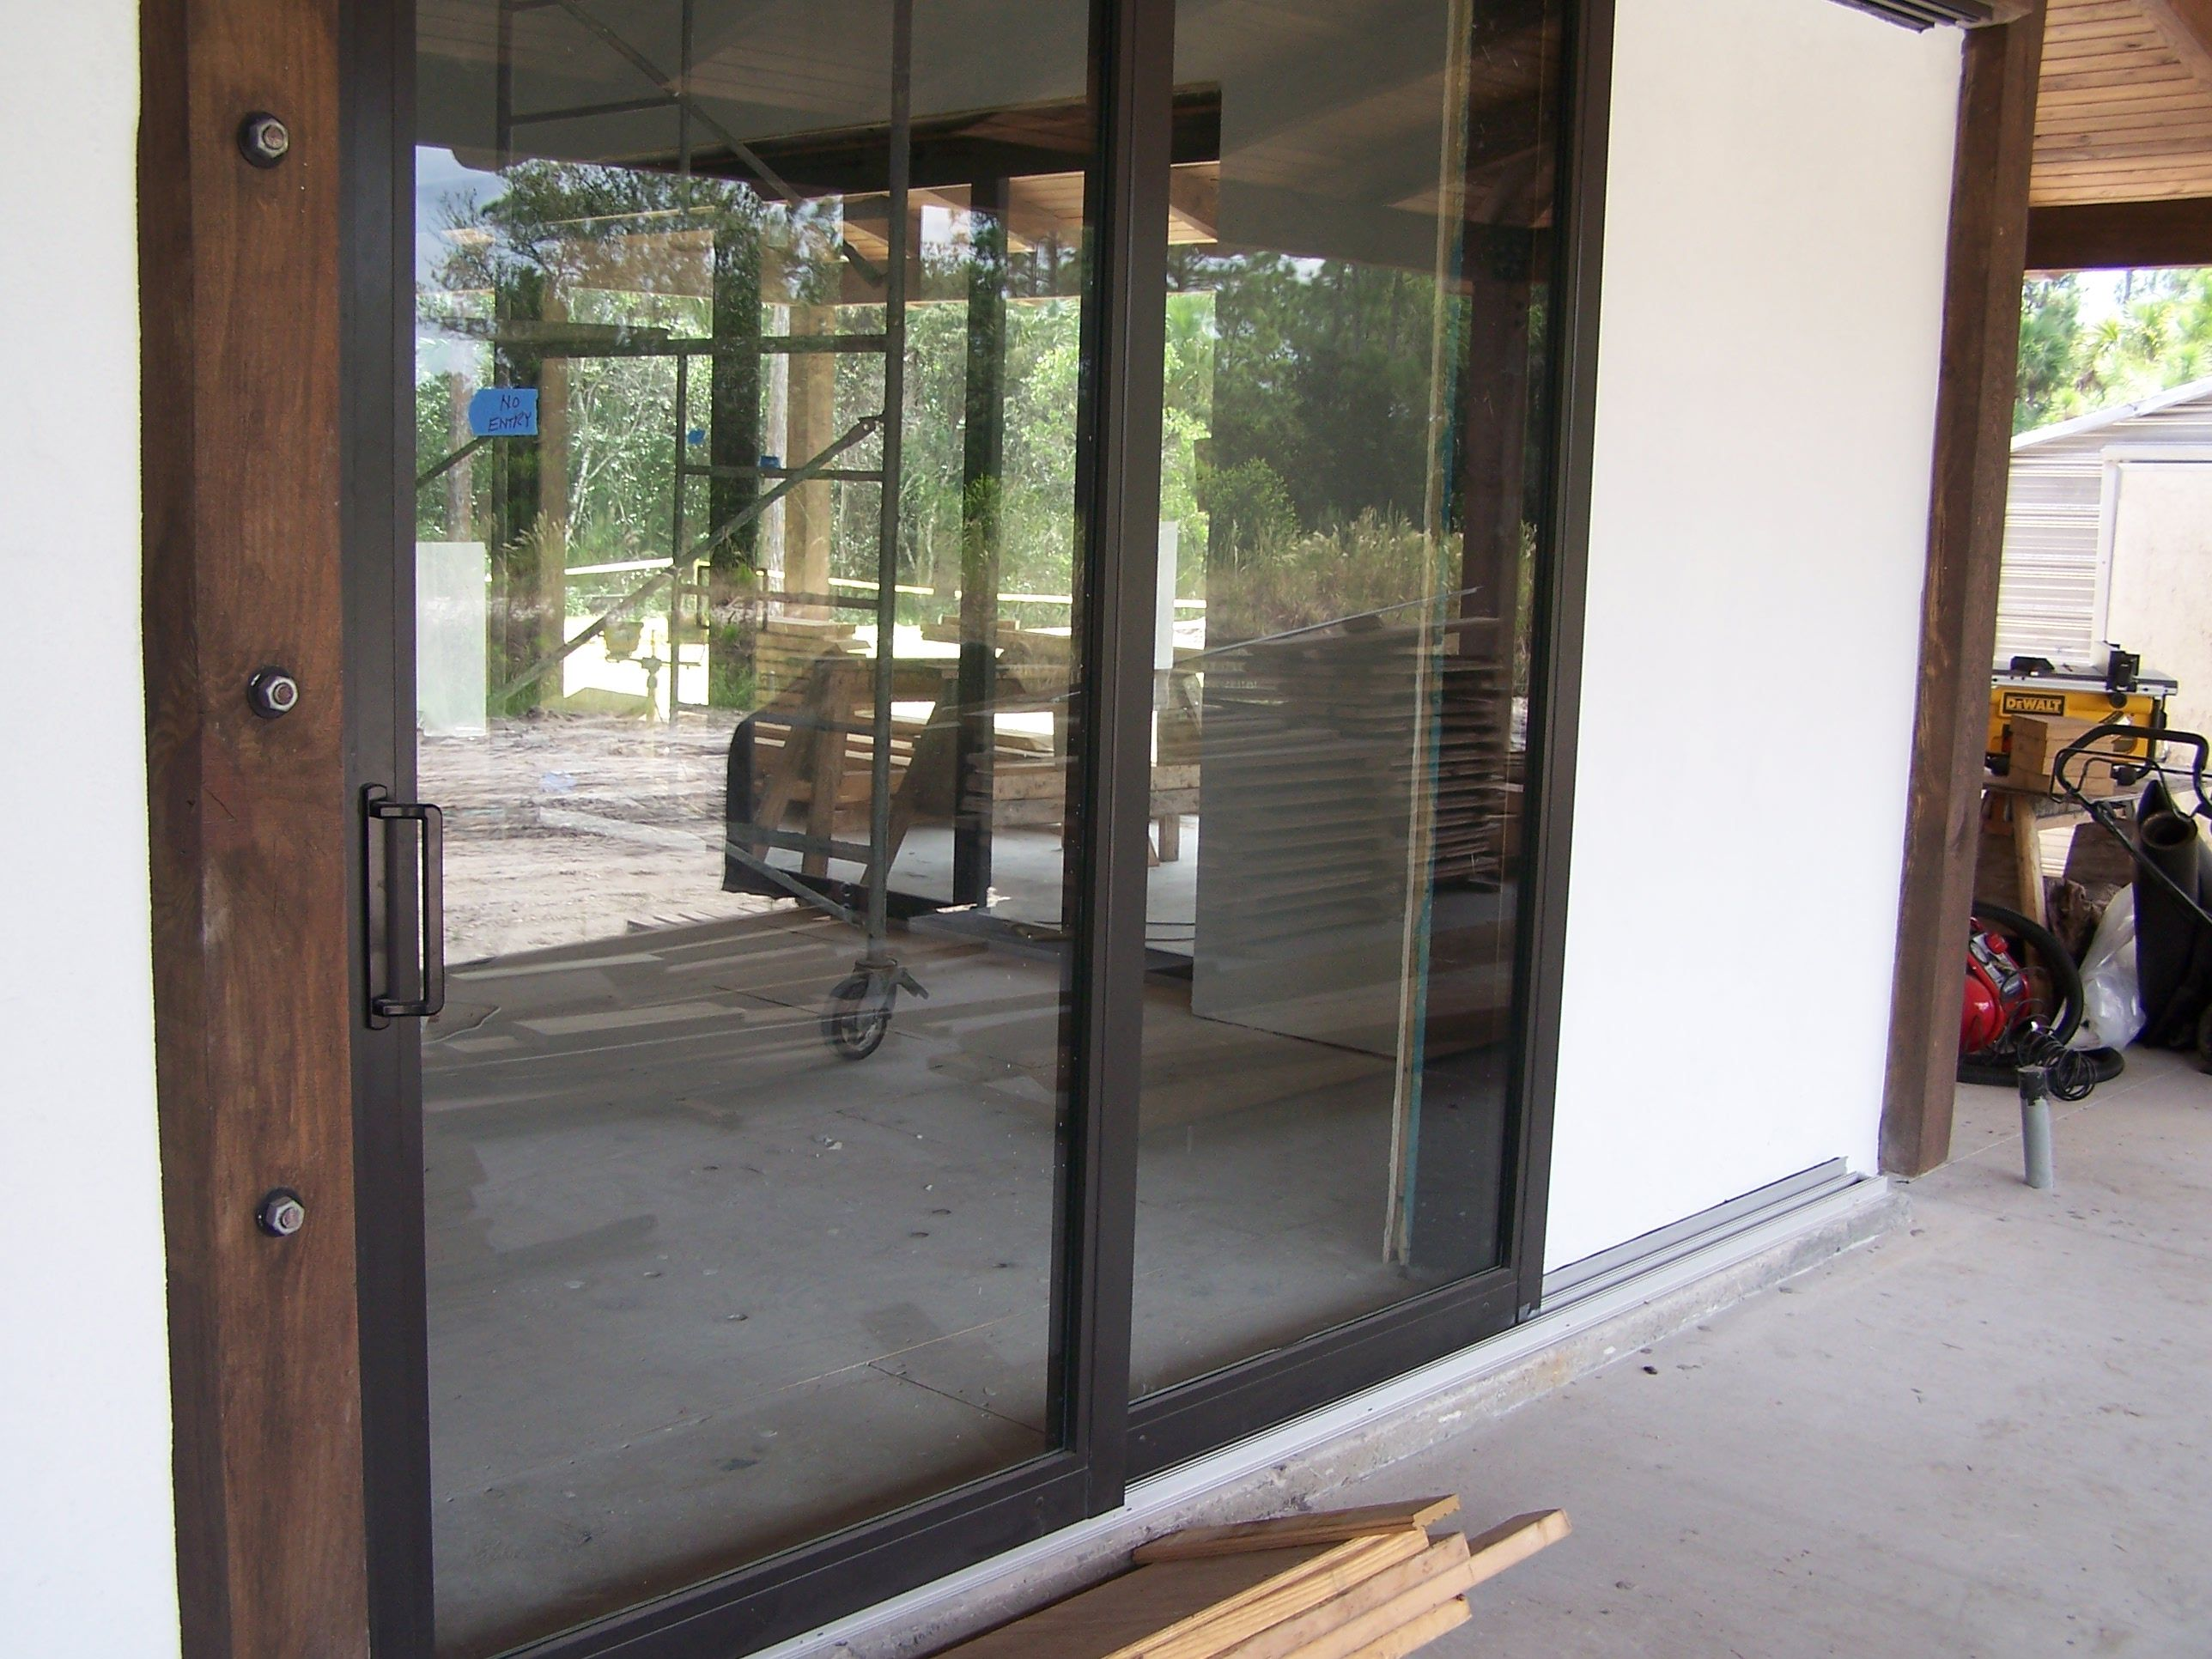 Pgt sliding glass doors photo album woonv handle idea pgt doors orlando pgt sliding glass door planetlyrics Image collections